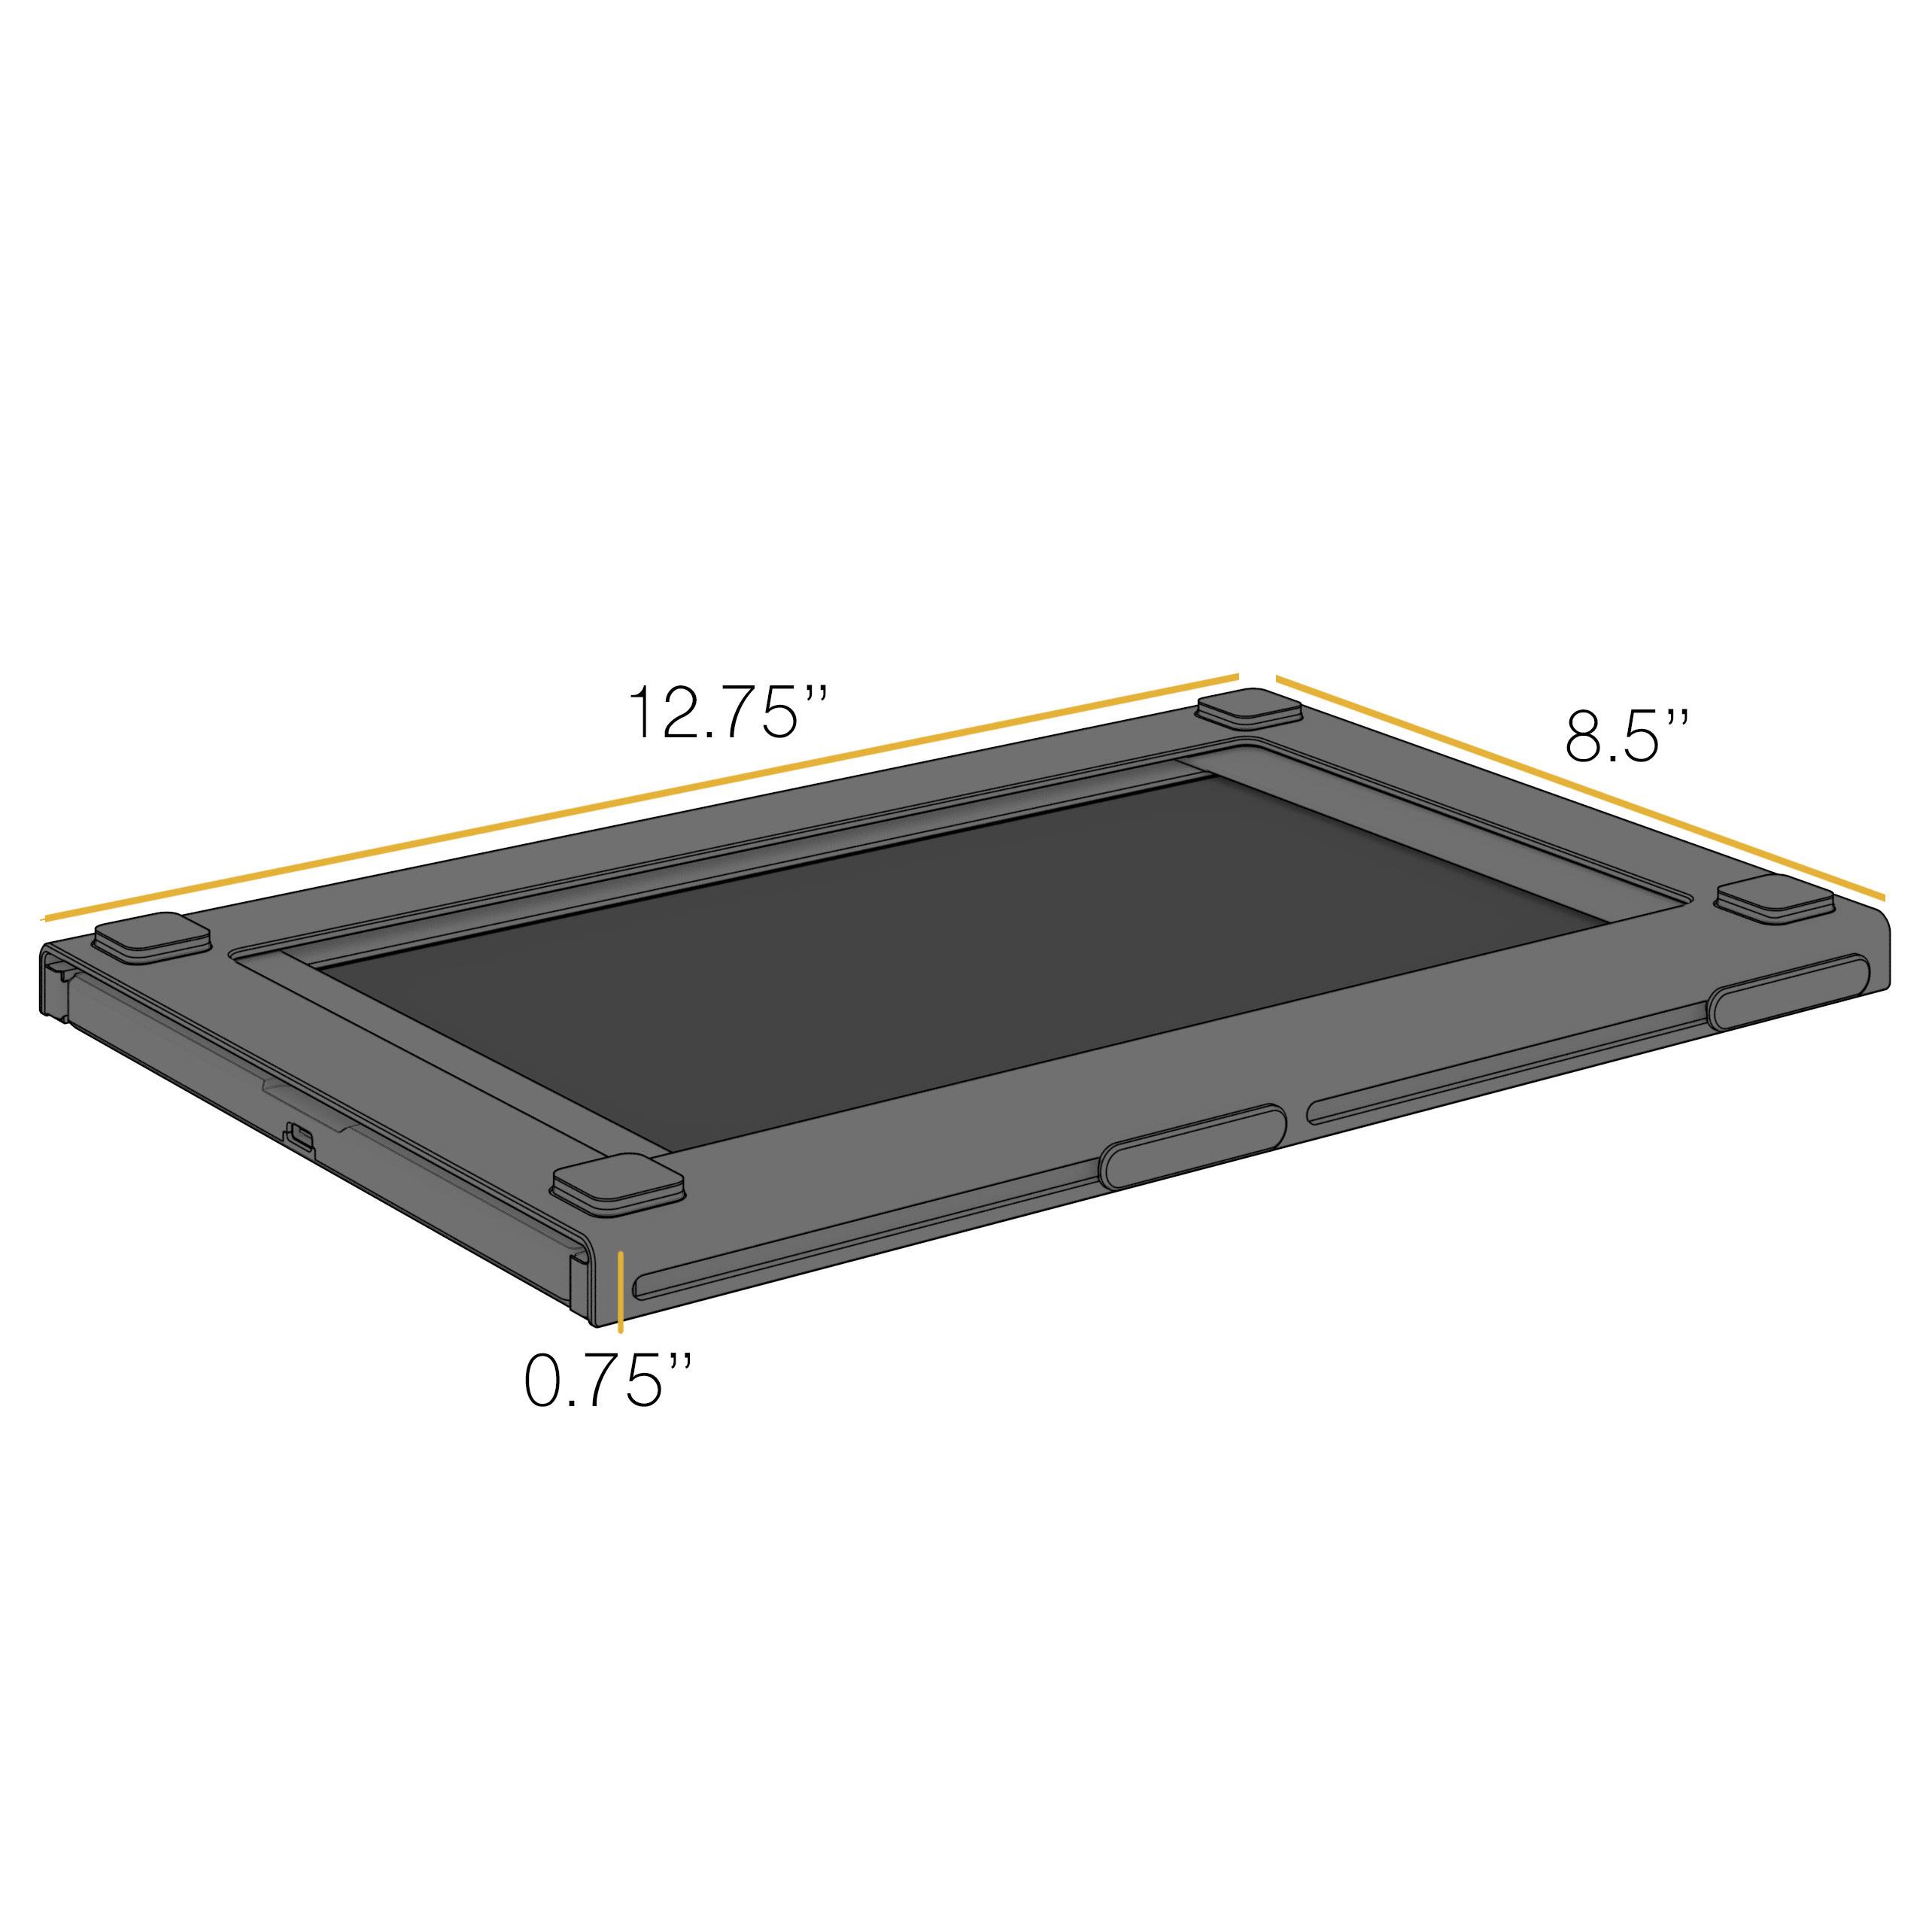 Slim, lightweight SideTrak portable laptop design